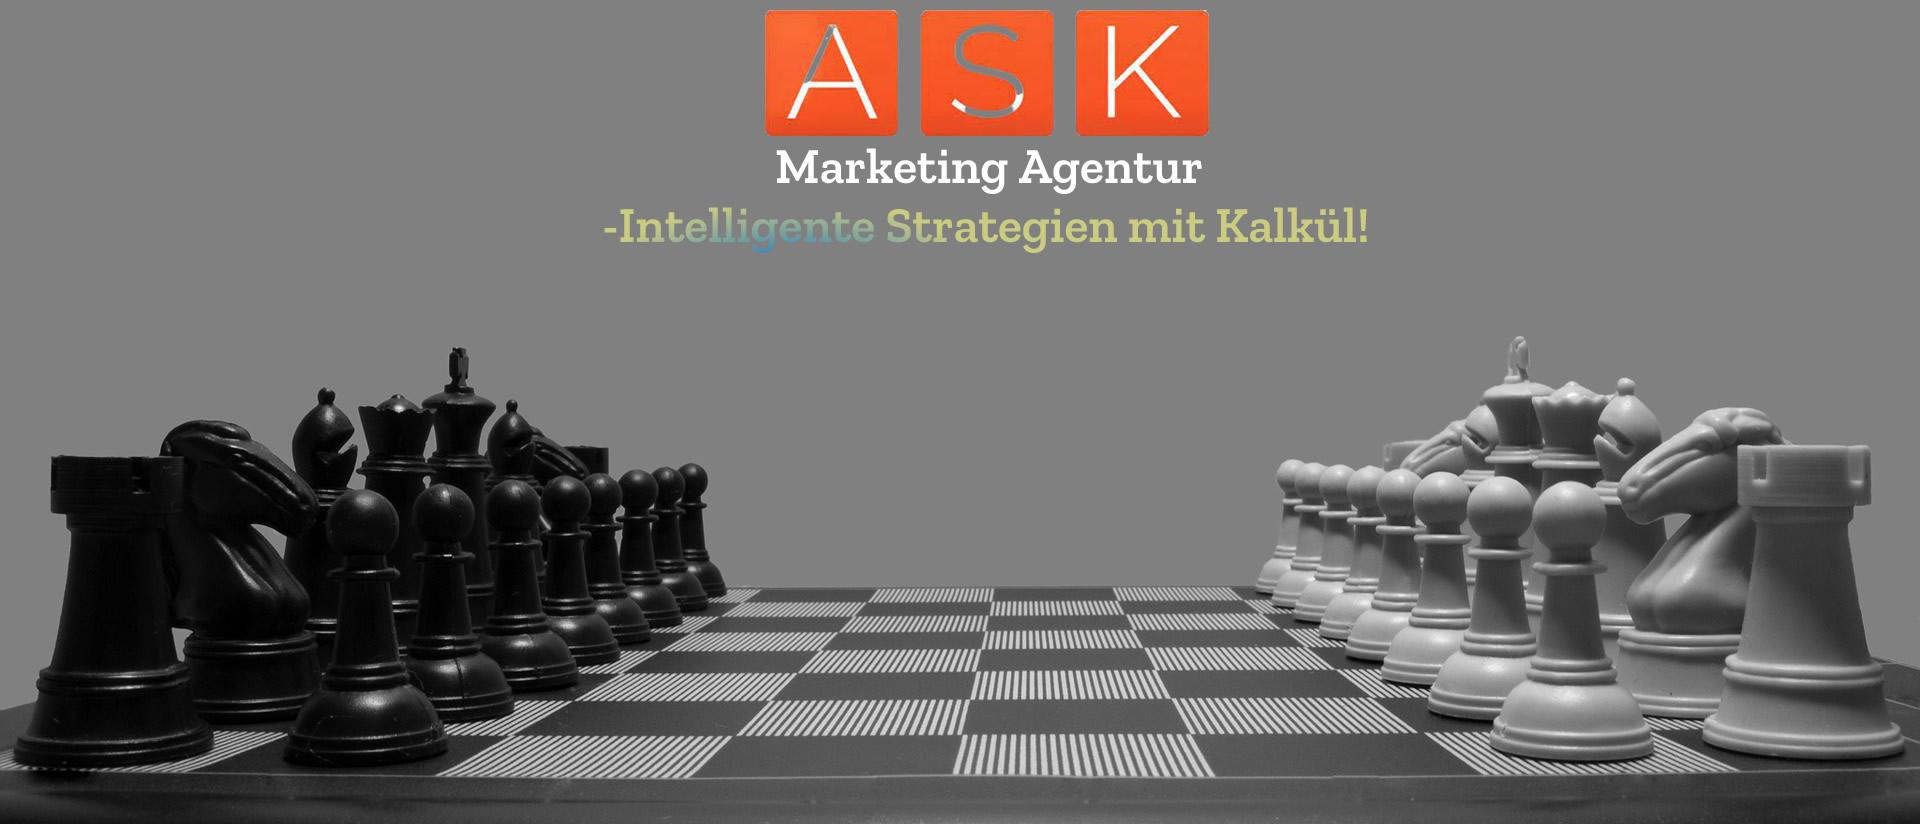 ASK Marketing Agentur Hannover SEO Vermarktung.